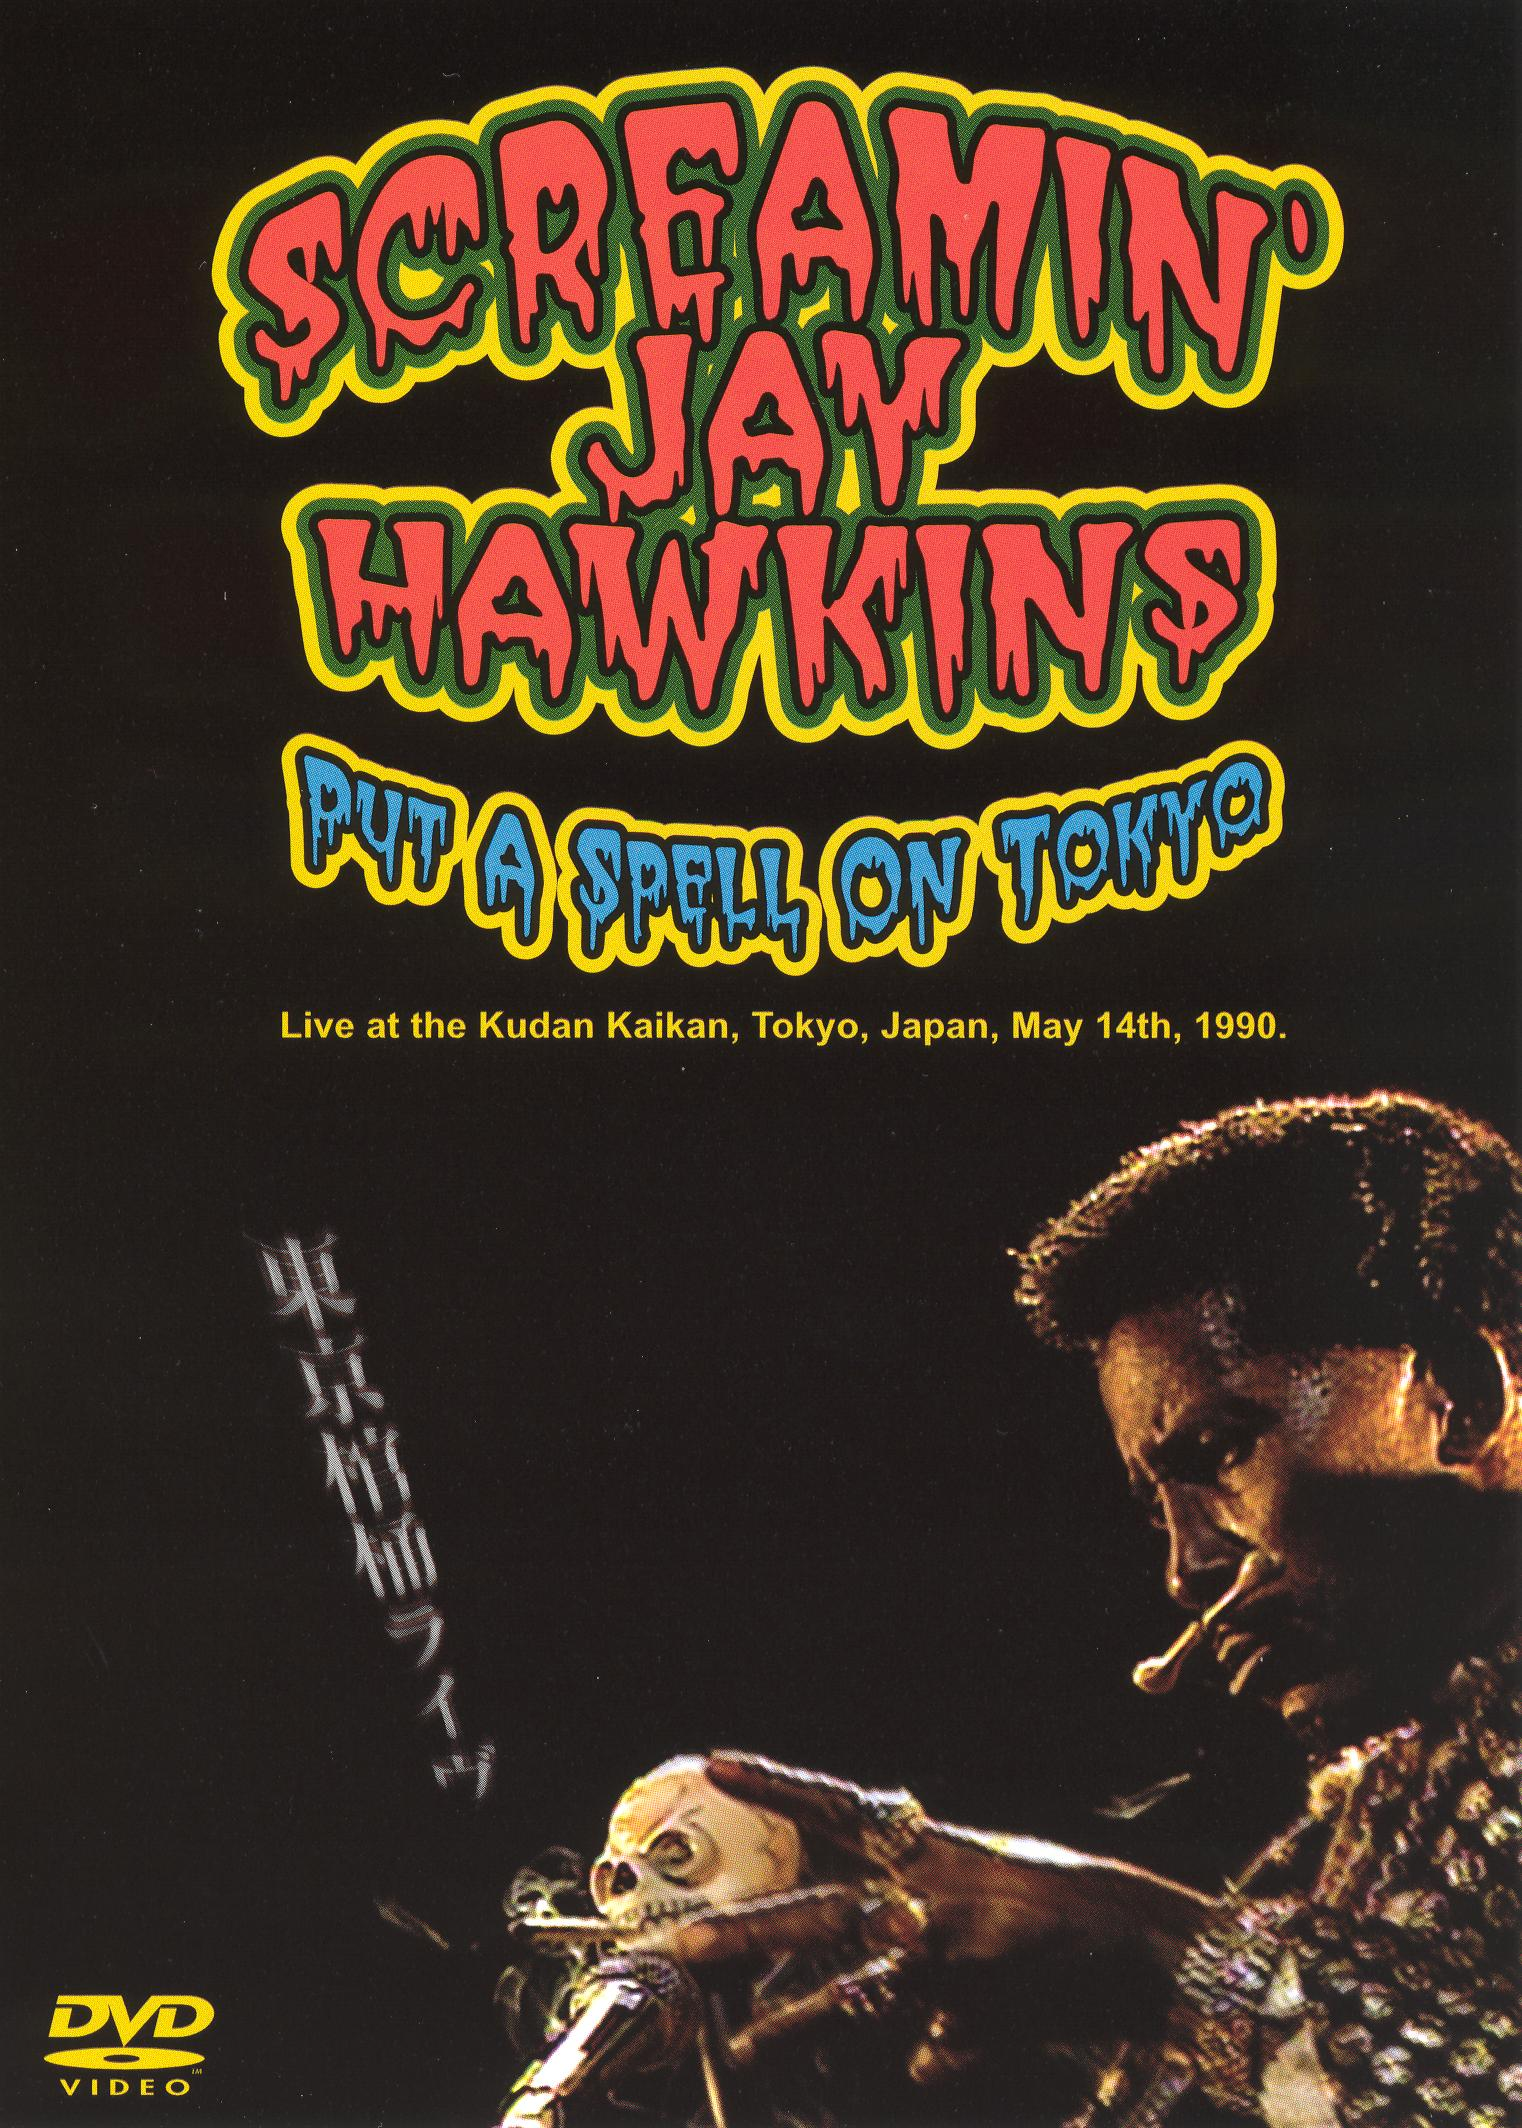 Screamin' Jay Hawkins: Put a Spell On Tokyo